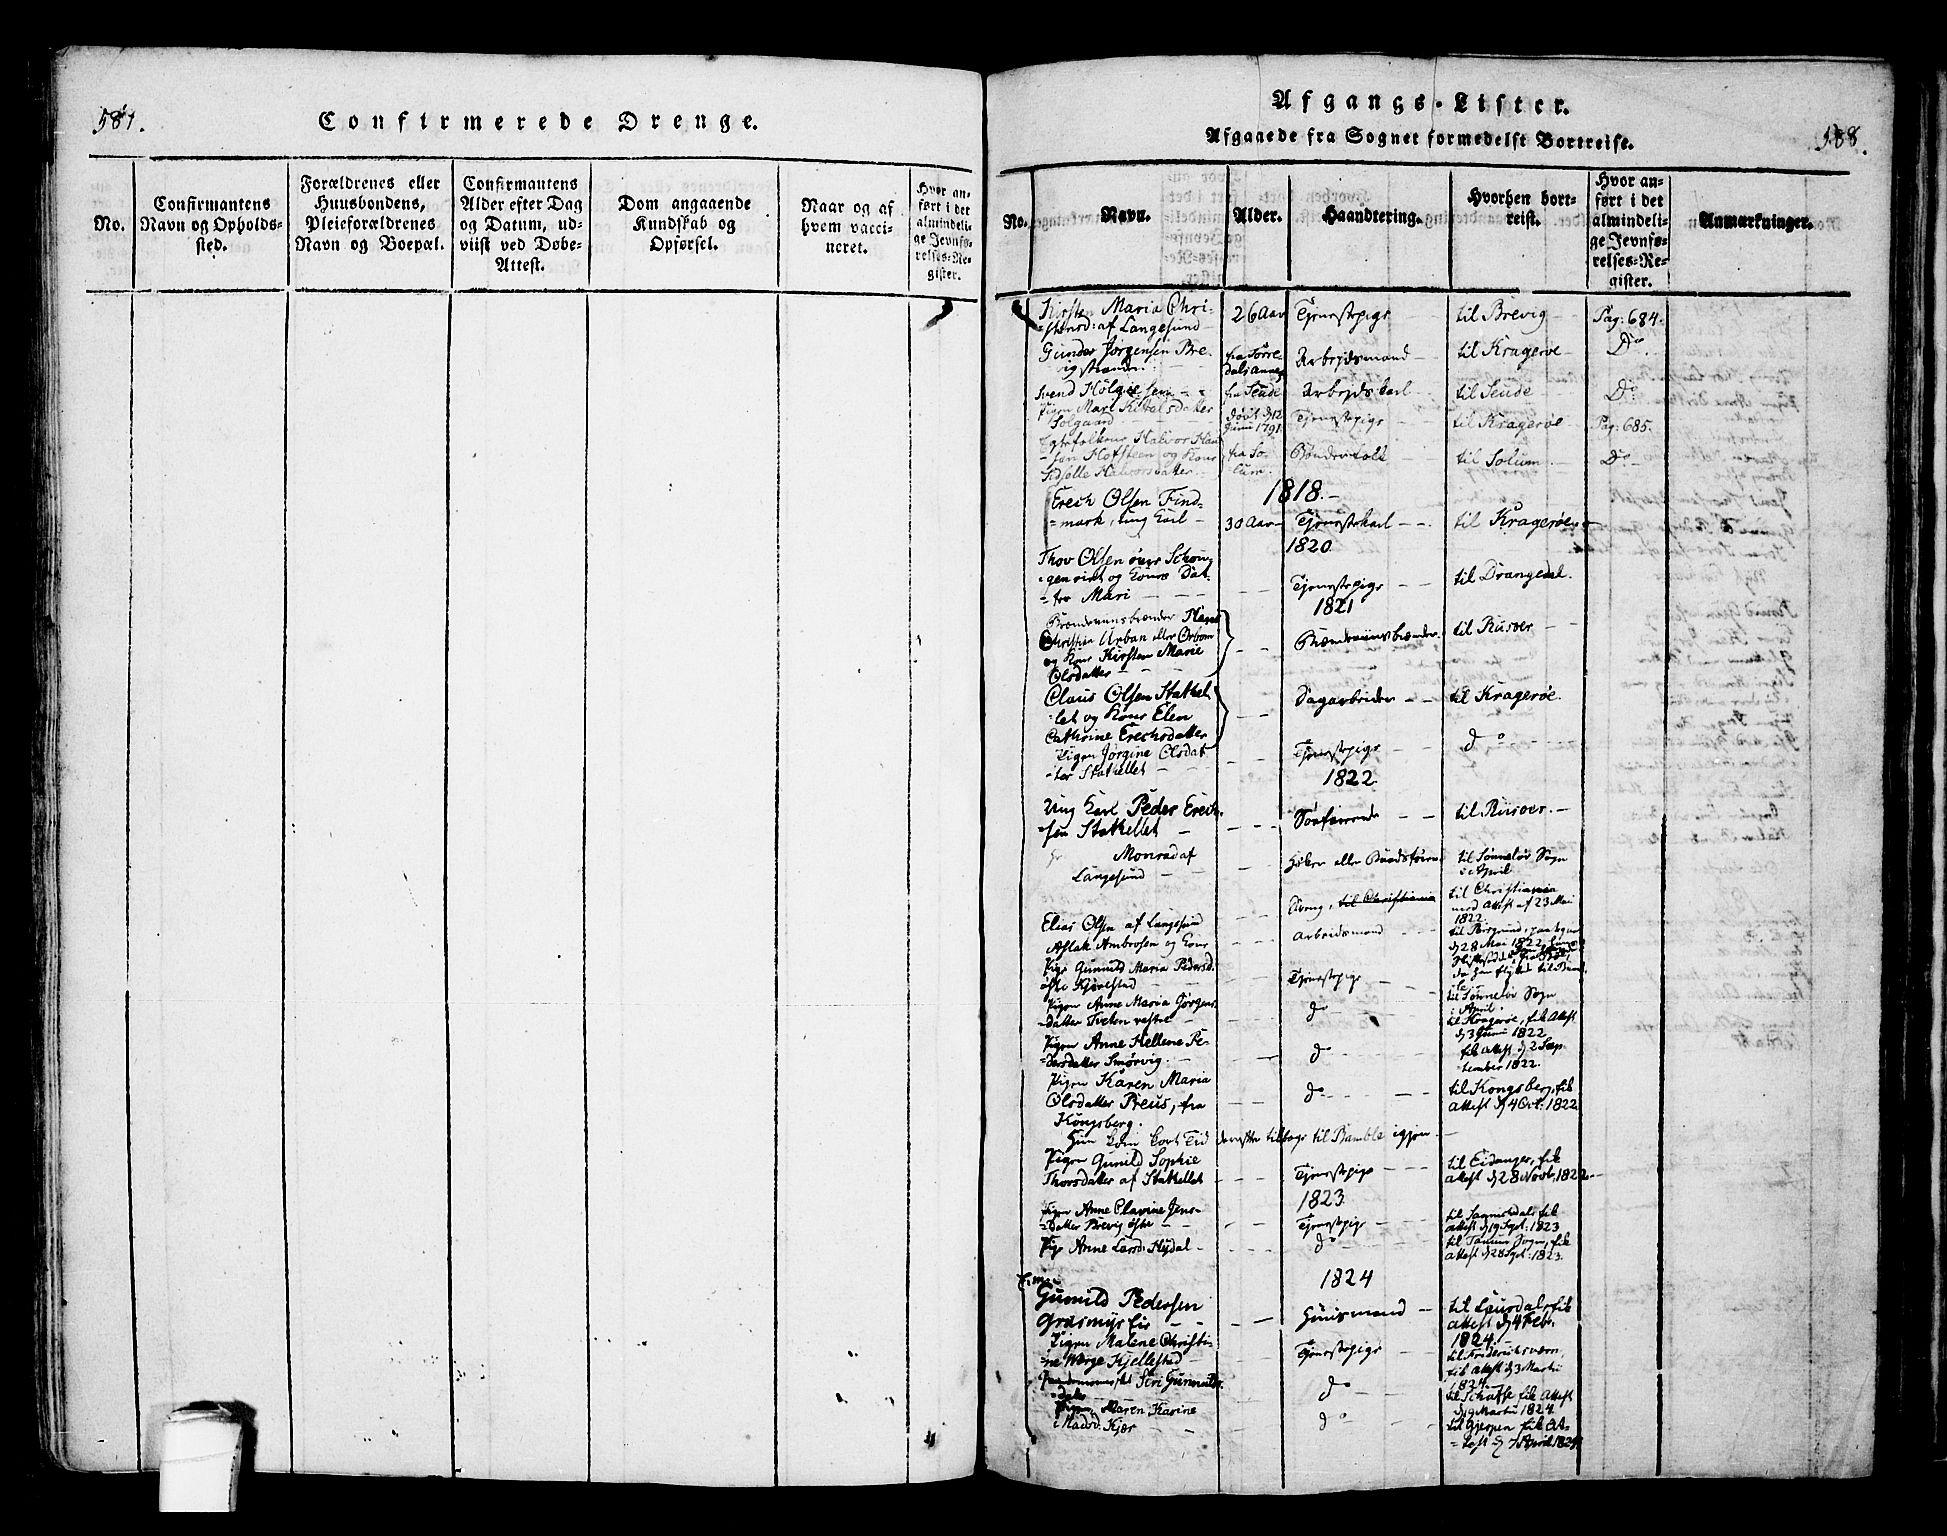 SAKO, Bamble kirkebøker, F/Fa/L0003: Ministerialbok nr. I 3 /1, 1814-1834, s. 587-588